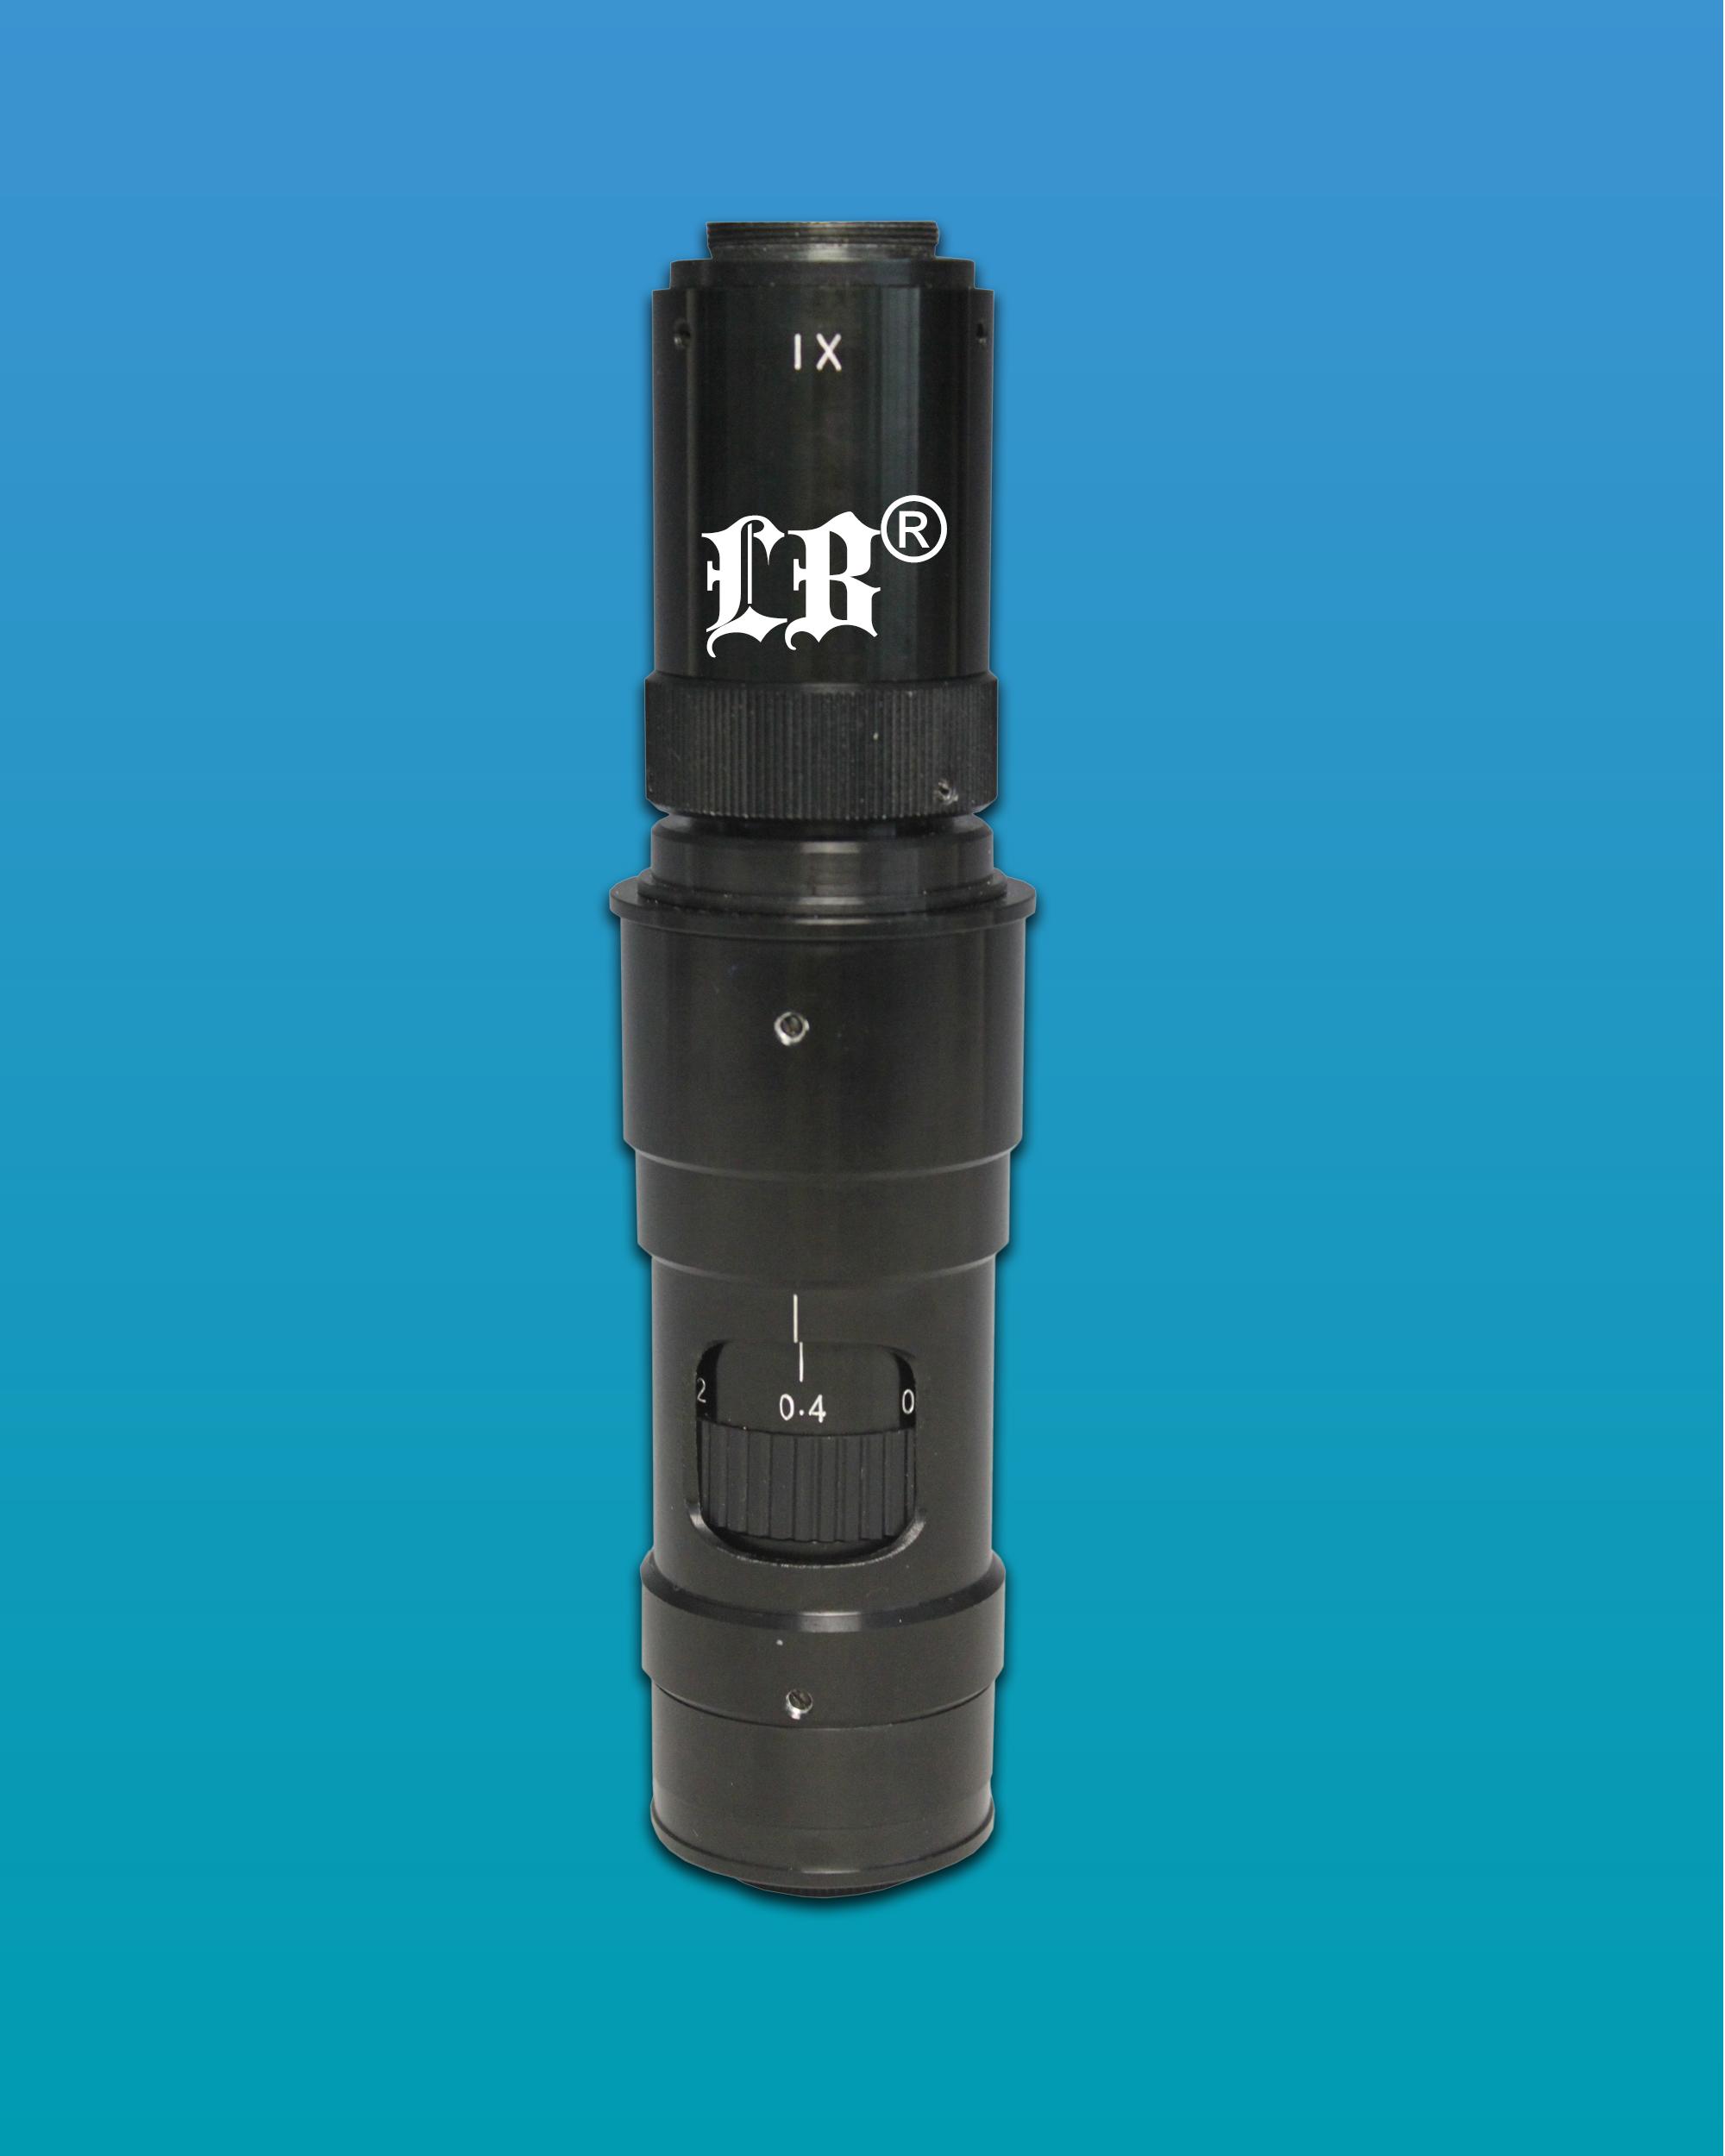 [LB-100] Monocular Microscope